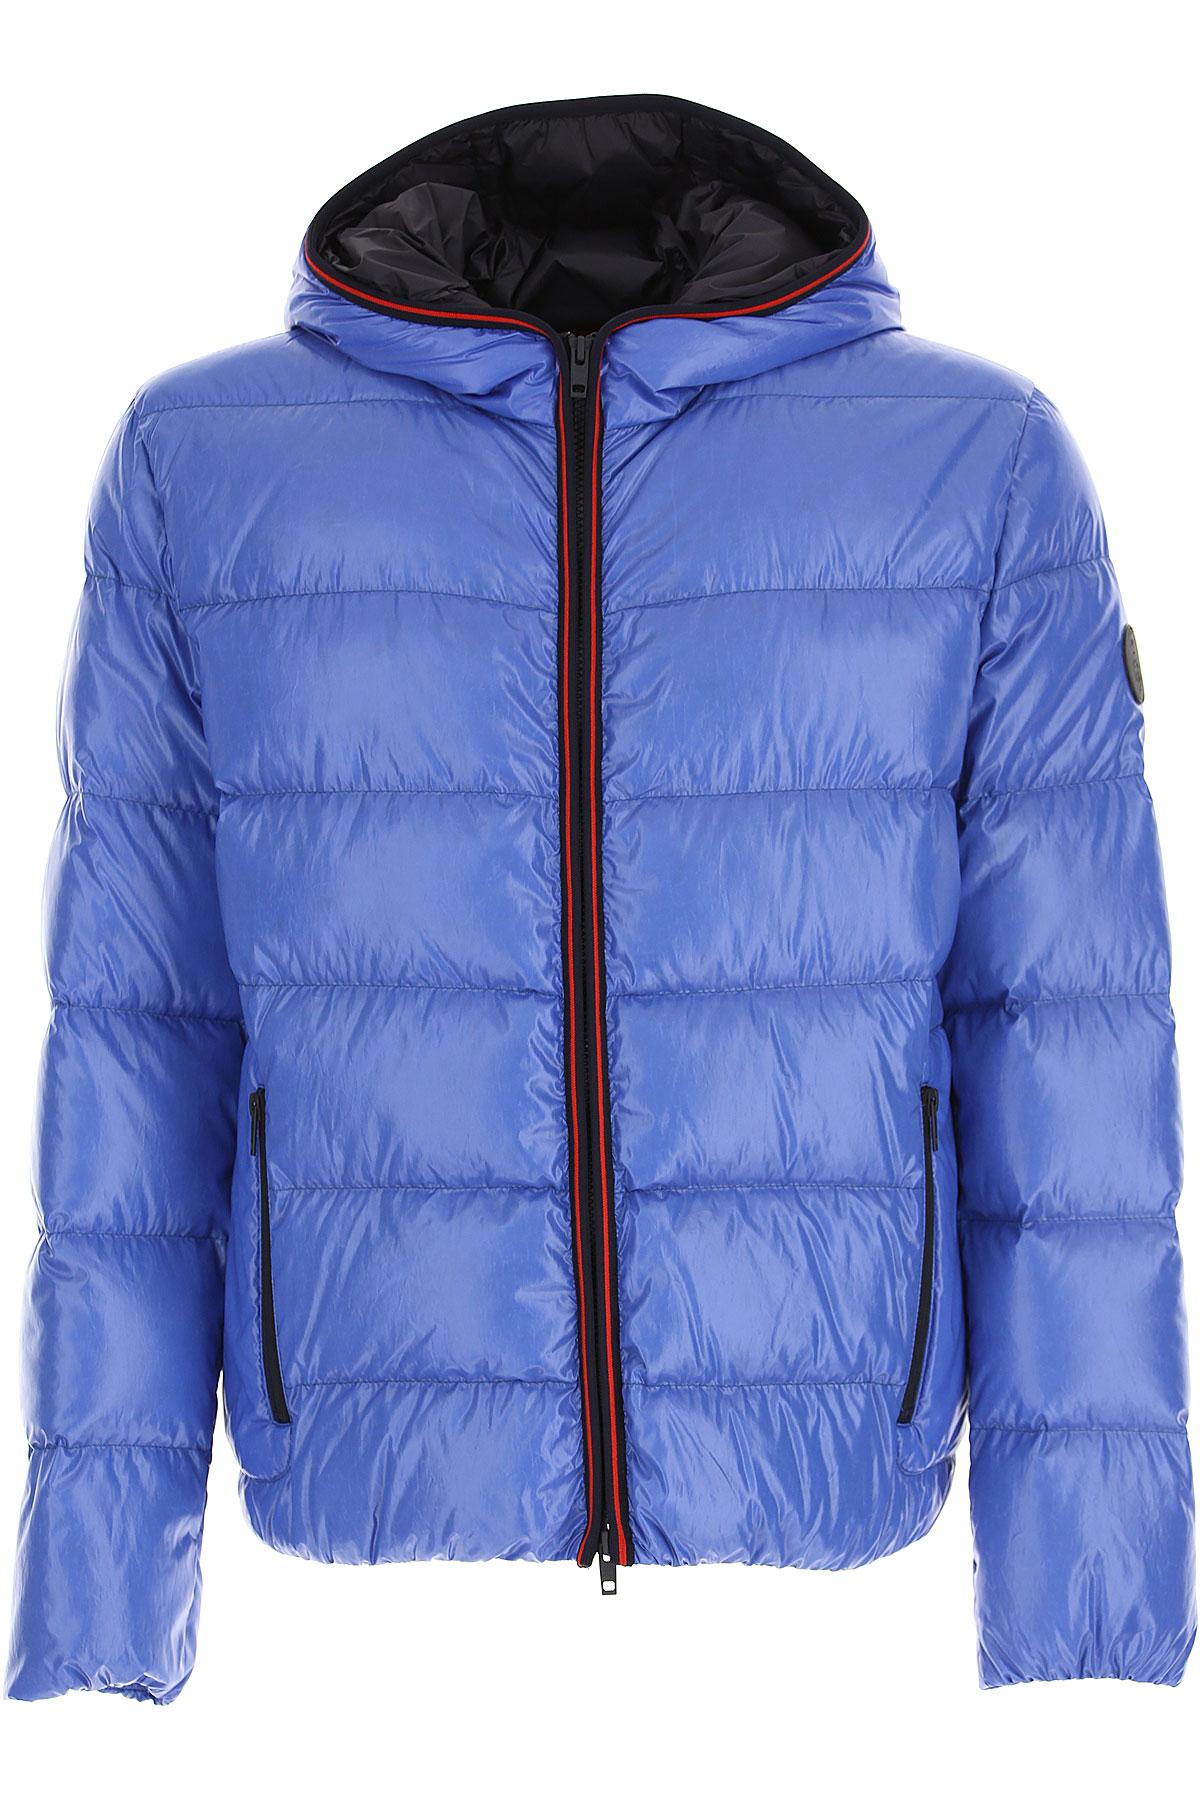 Fay Down Jacket for Men, Puffer Ski Jacket, Light Blue, polyamide, 2019, L M S XL